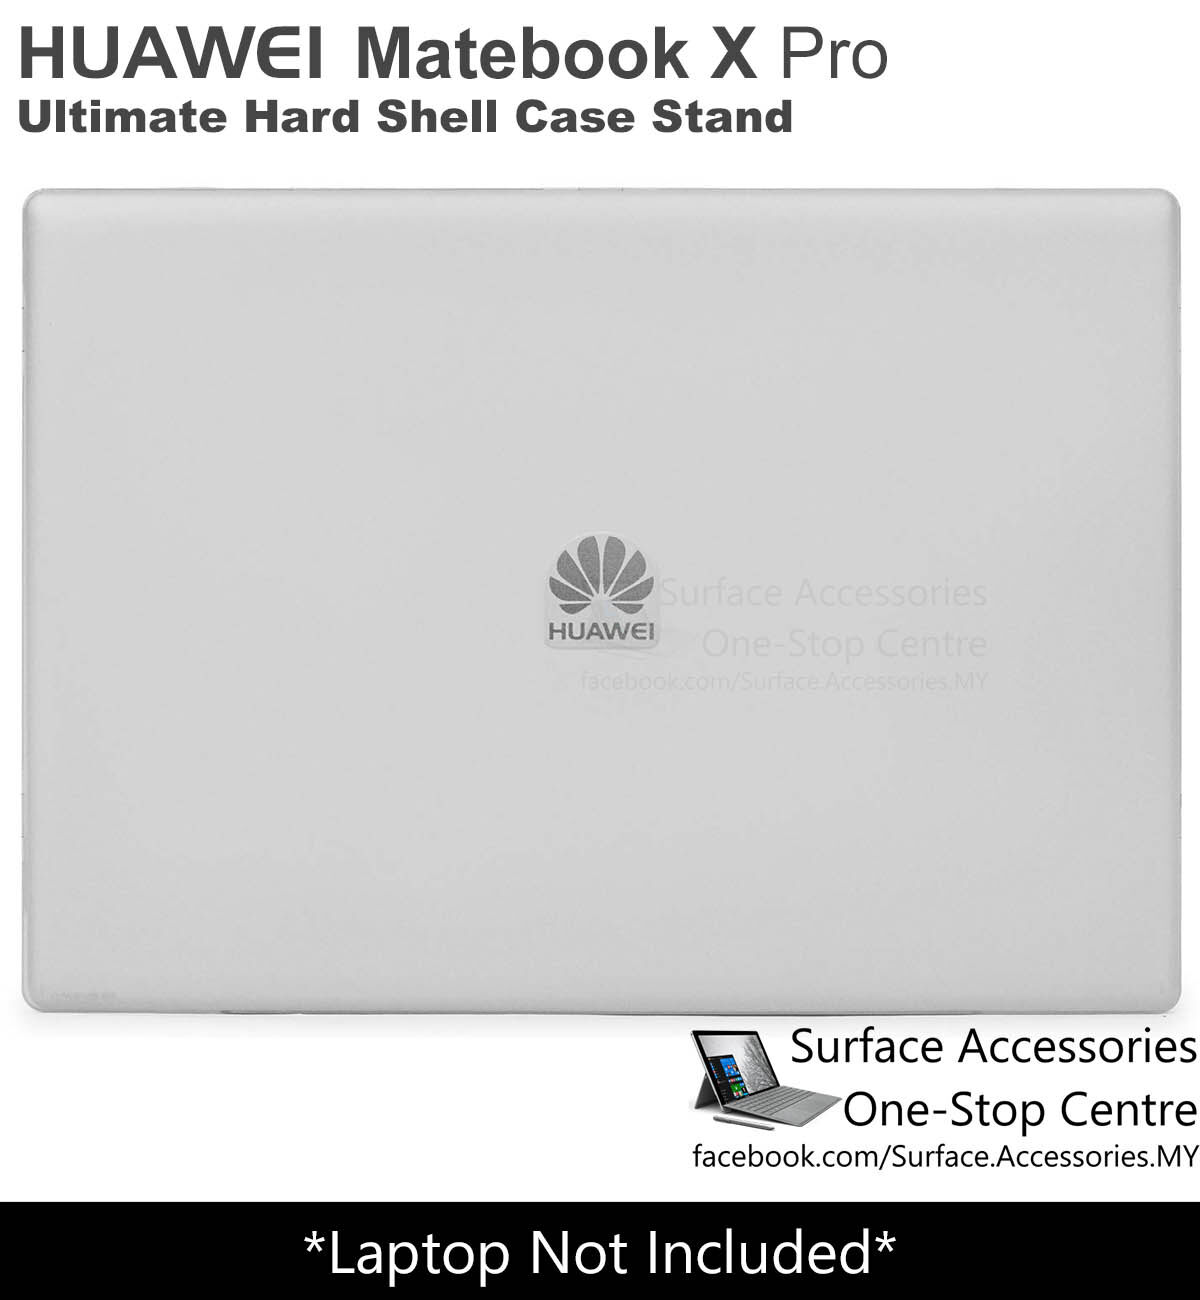 [MALAYSIA]HUAWEI MateBook X Pro 13.9 Ultimate Case Stand Cover HUAWEI MateBook X Pro Flip Case HUAWEI MateBook X Pro Cover HUAWEI MateBook X Pro Stand HUAWEI MateBook X Pro 13.9